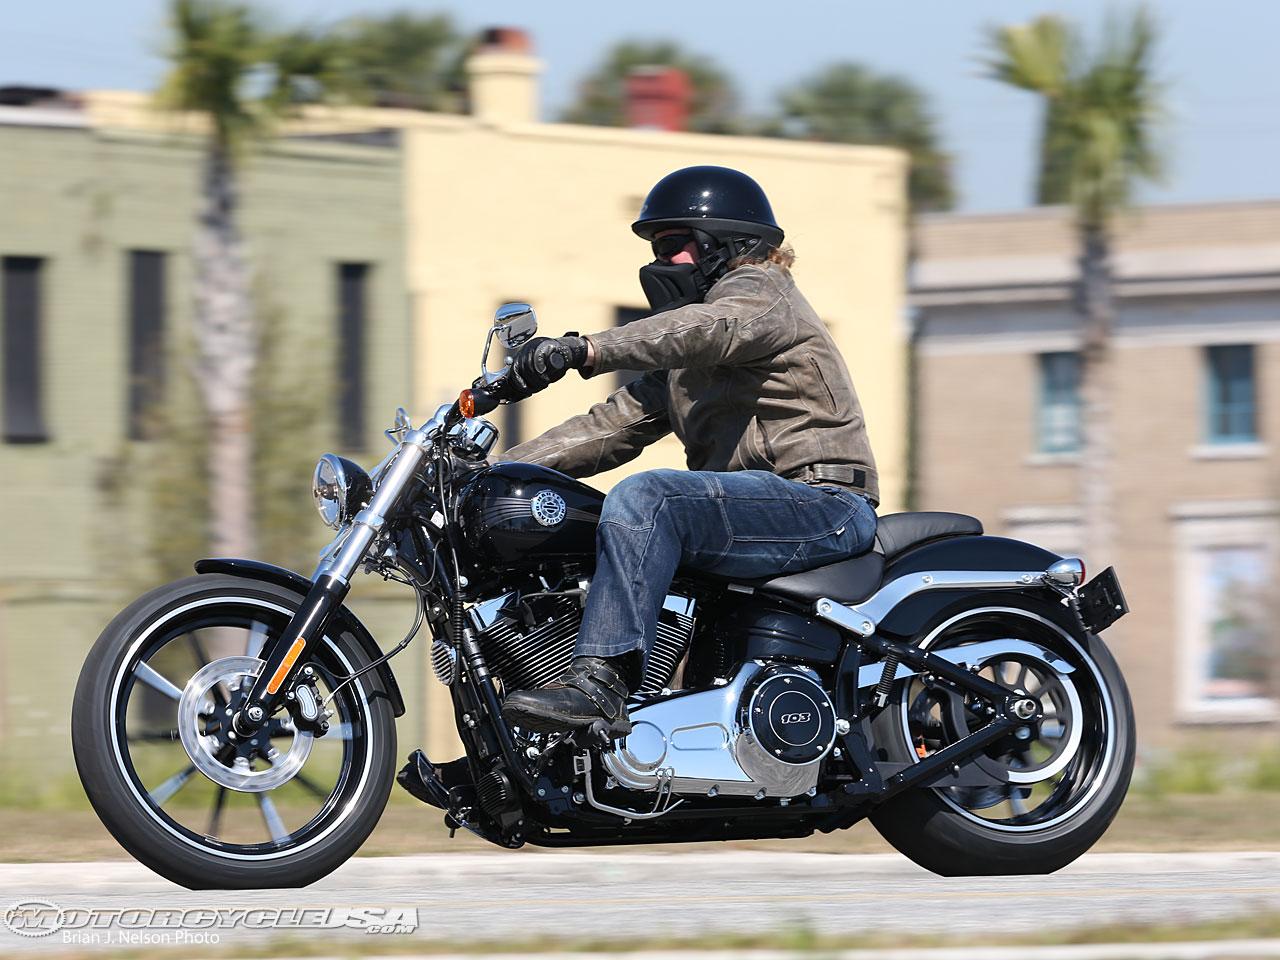 Comment importer une moto au royaume uni avec UKMOTO 2 - Comment importer une moto au royaume uni avec UKMOTO